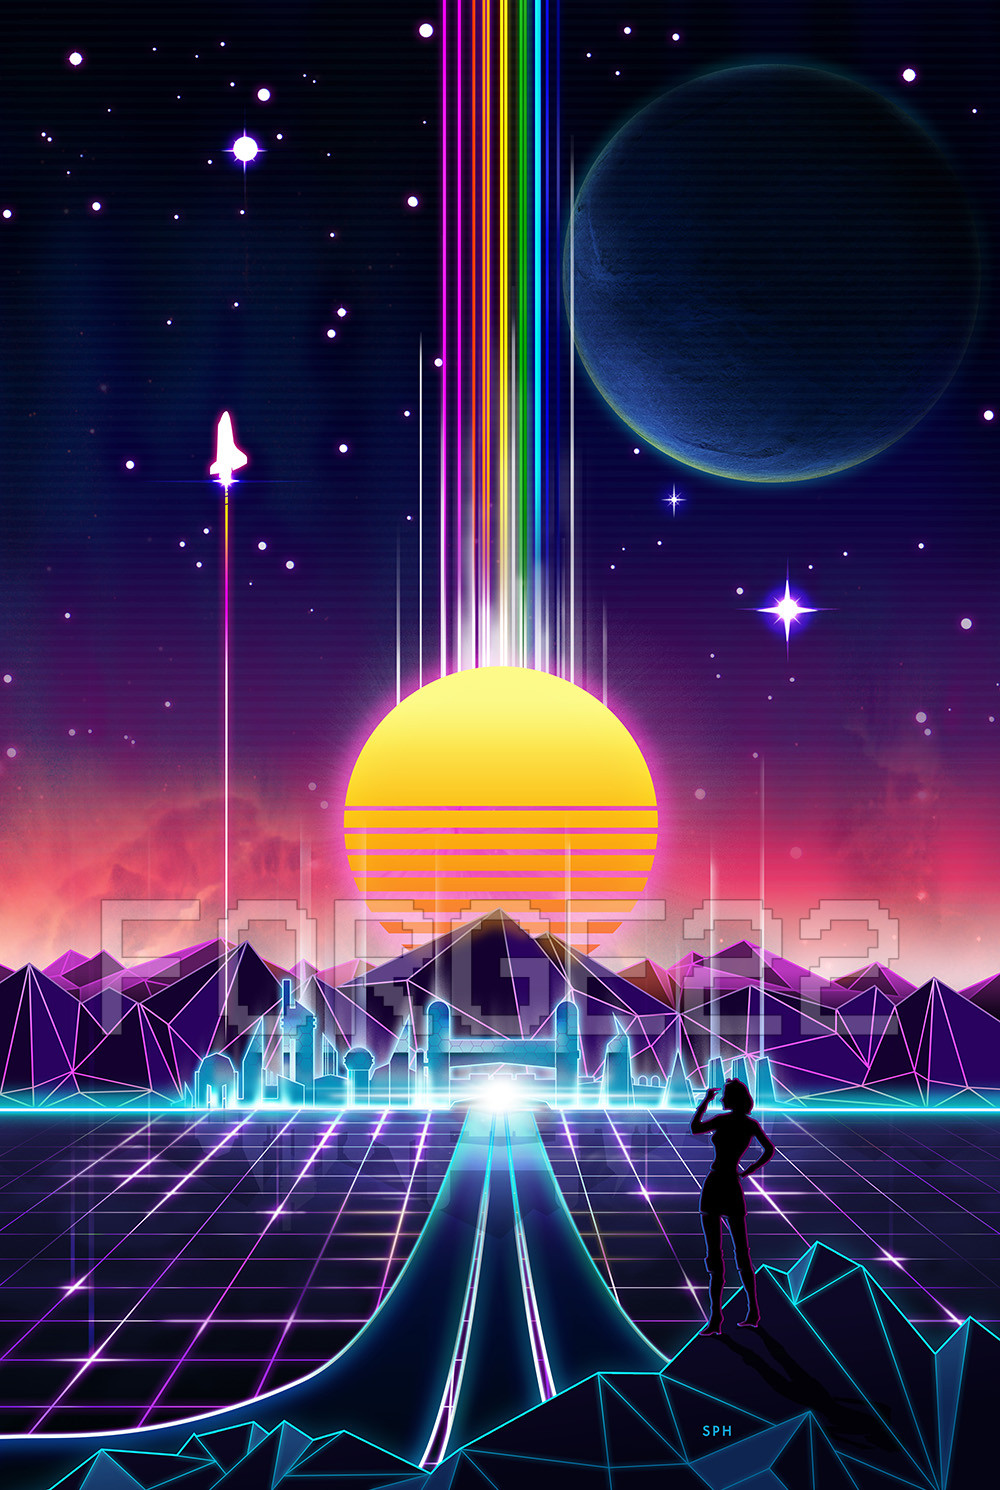 Synthwave Outrun Visual Art Design - Neon 80's grid future Vaporwave